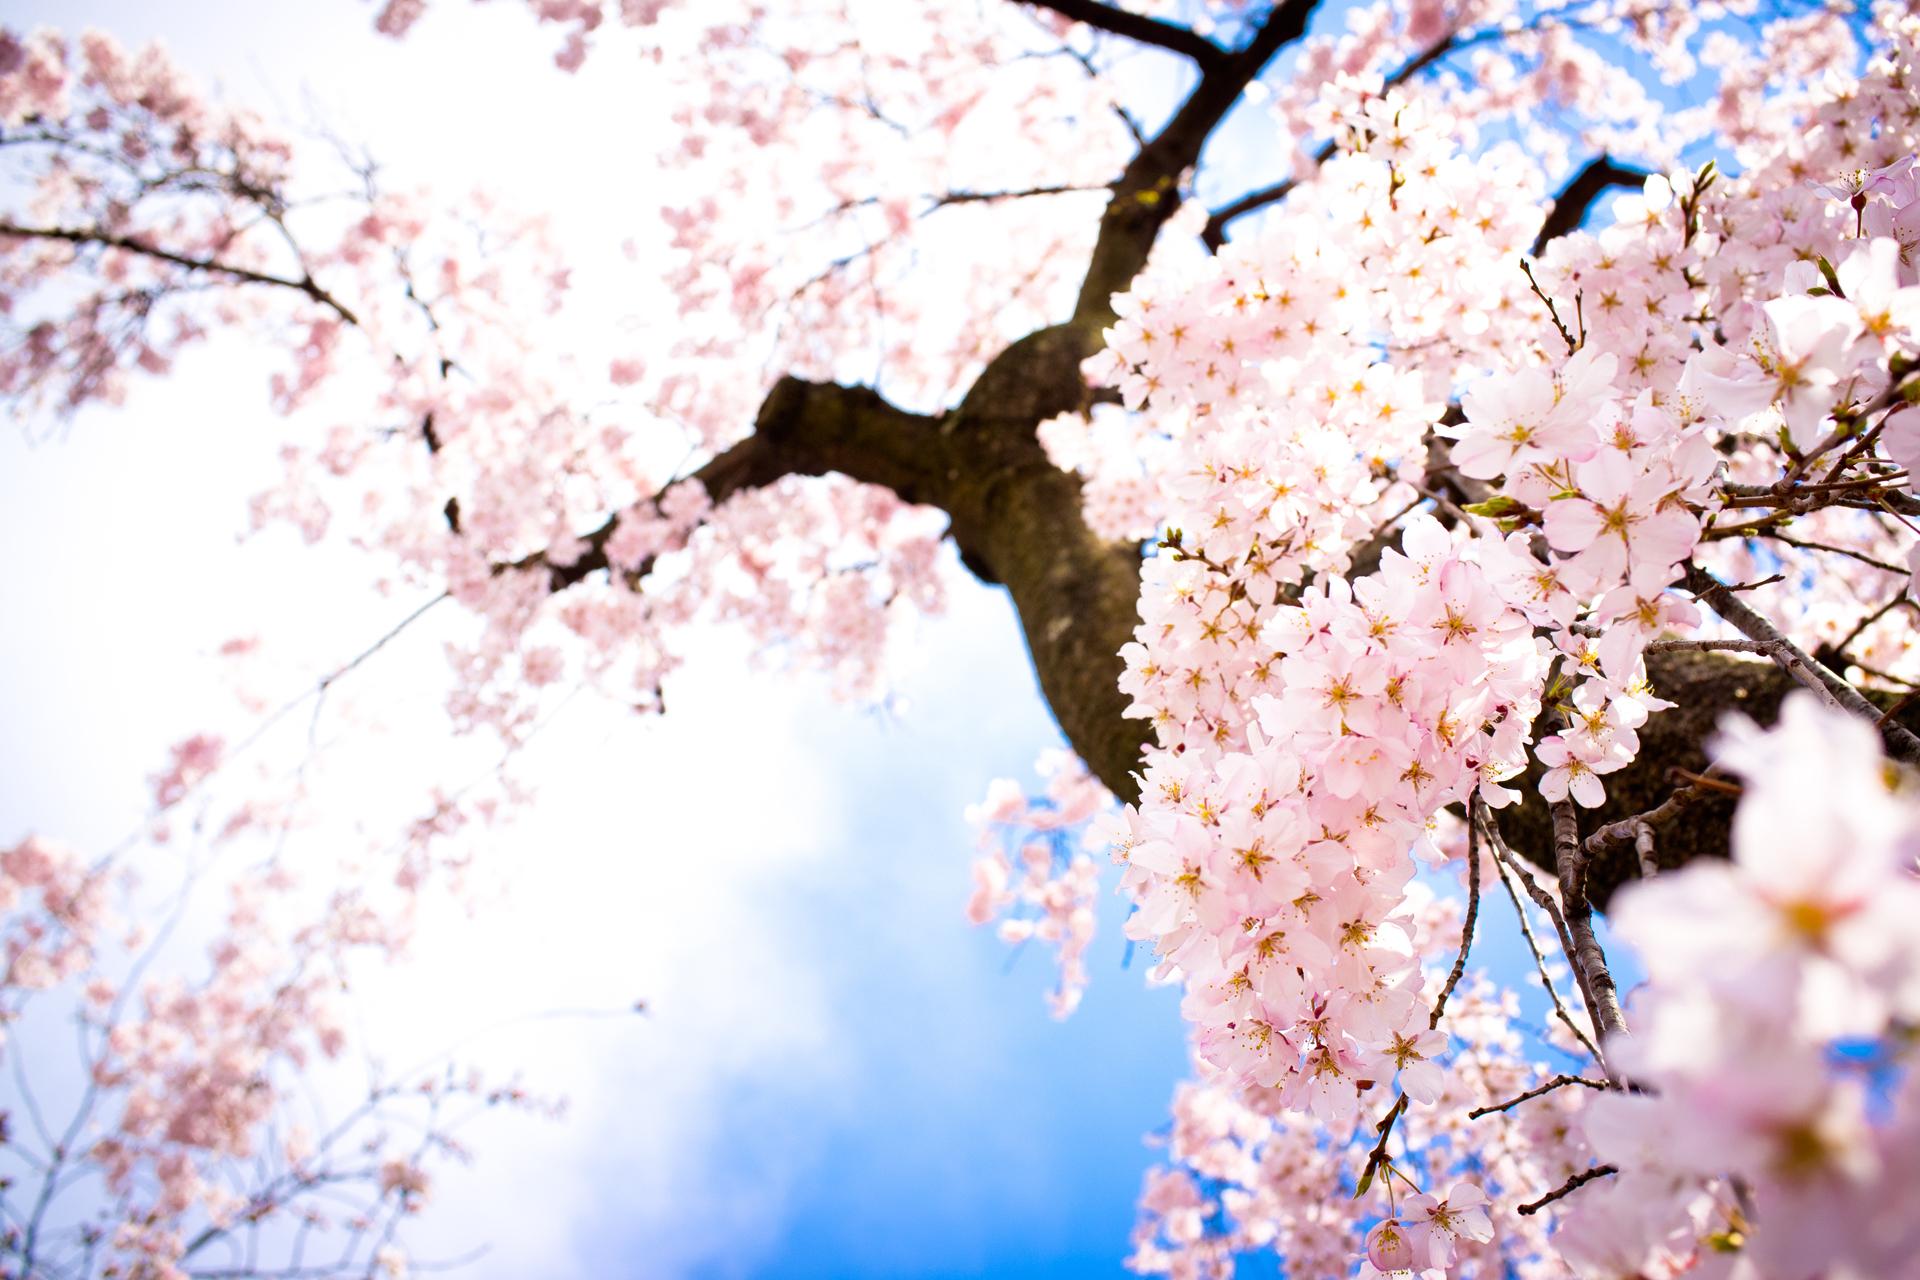 Drawn sakura blossom anime  Cherry Blossom Drawing Tree